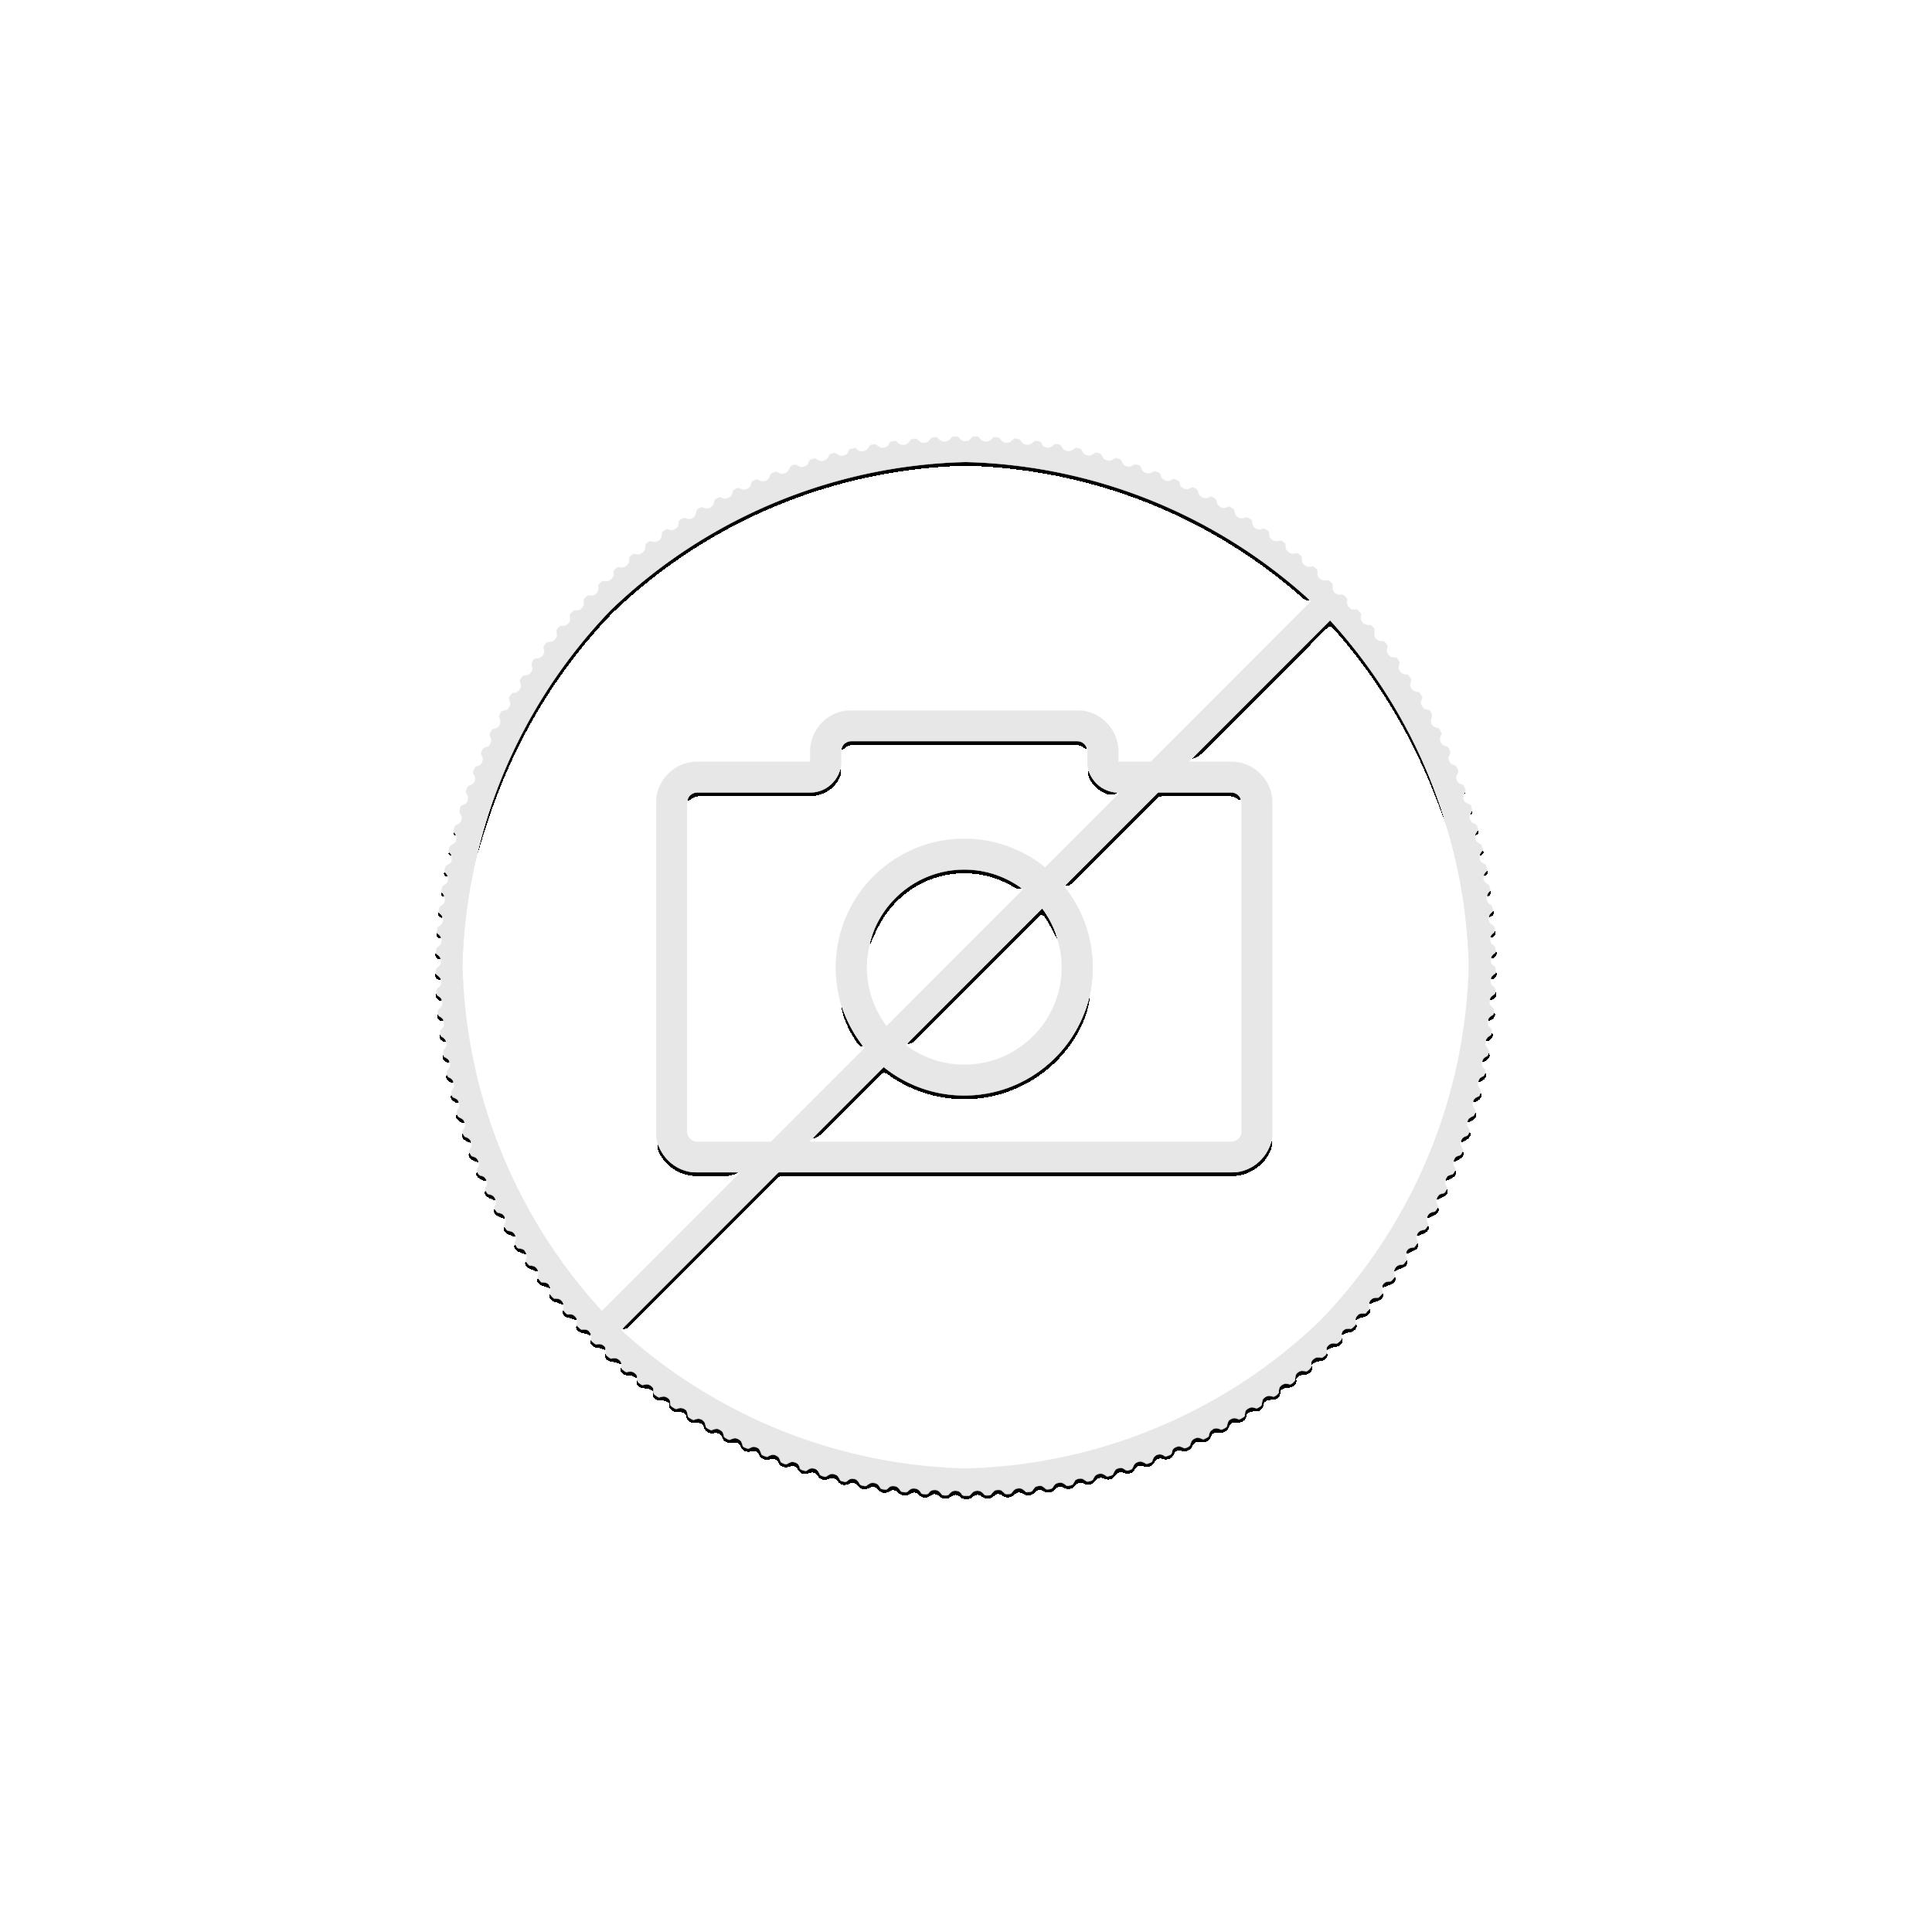 2 Troy ounce silver coin Mexican Libertad 2019